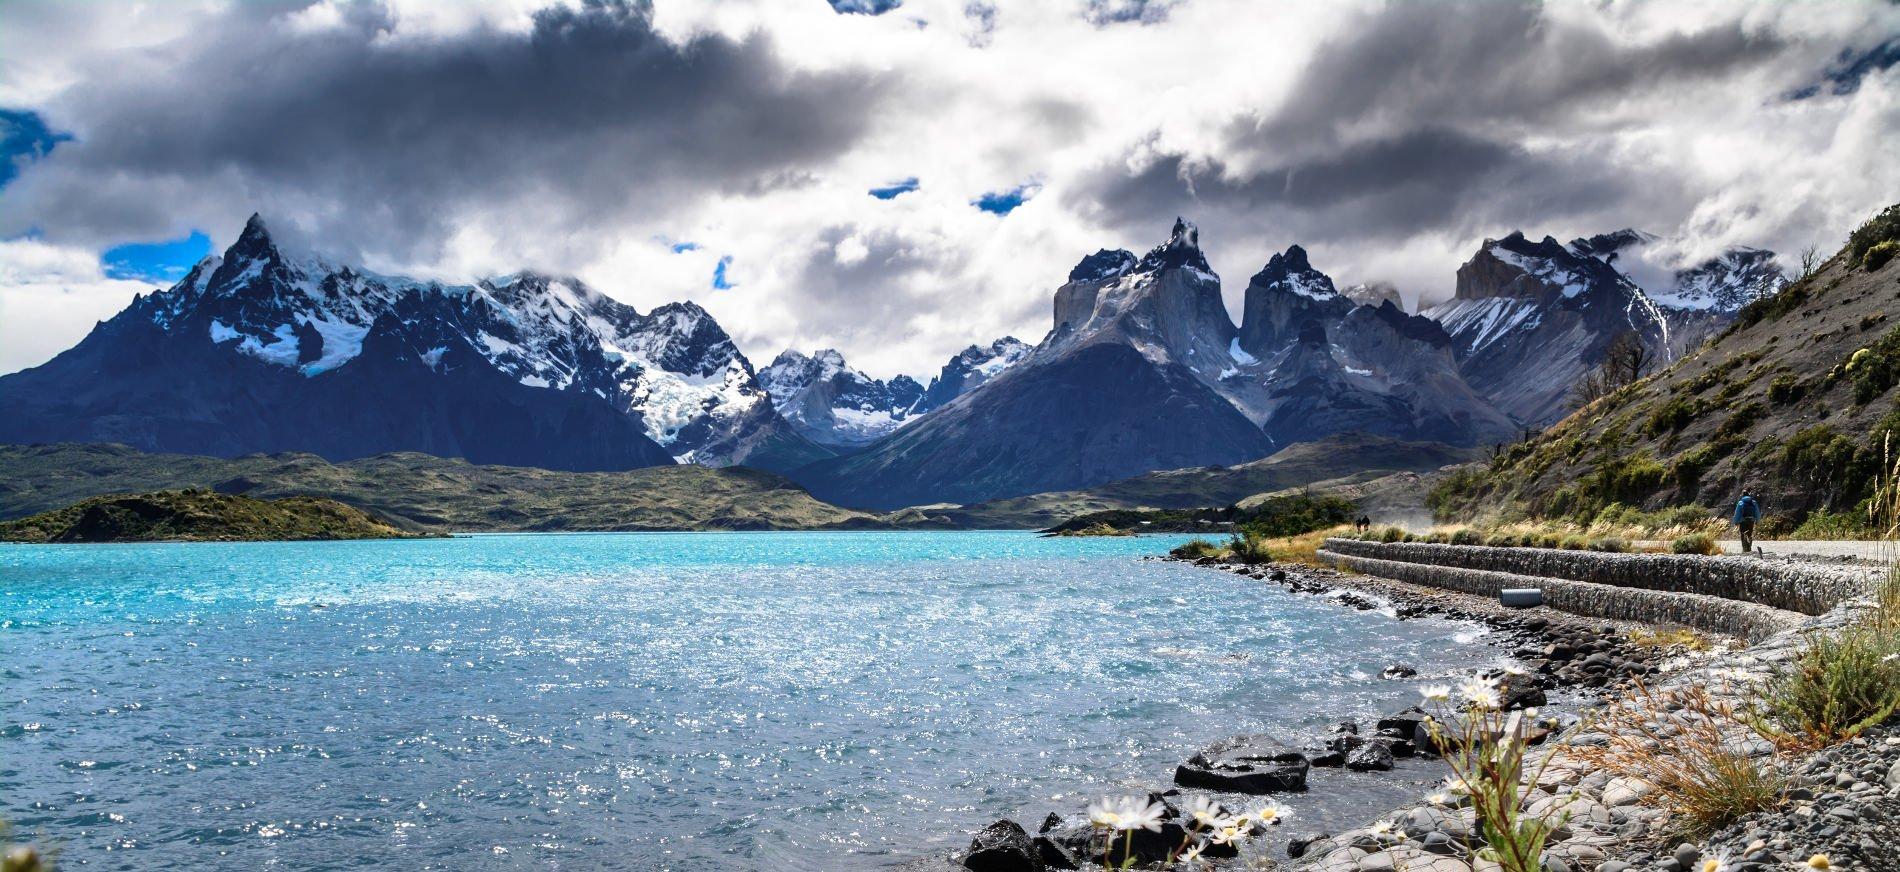 Mastro Patagonico – Slide Home